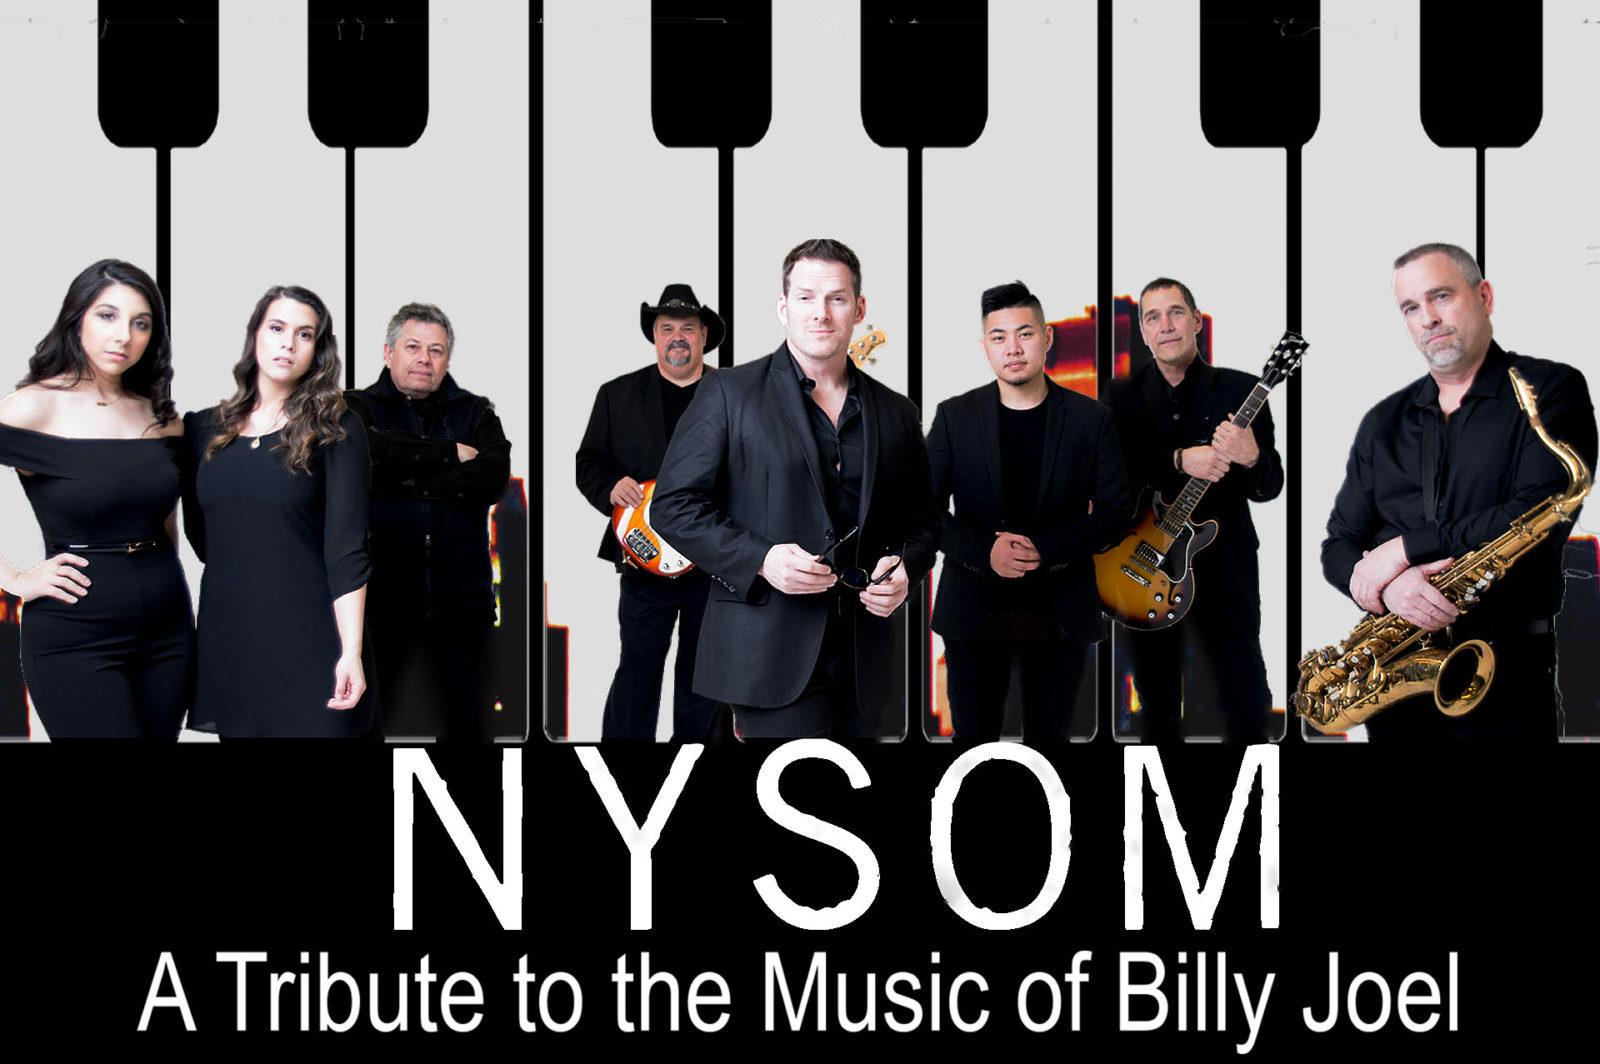 nysom-homepage-02